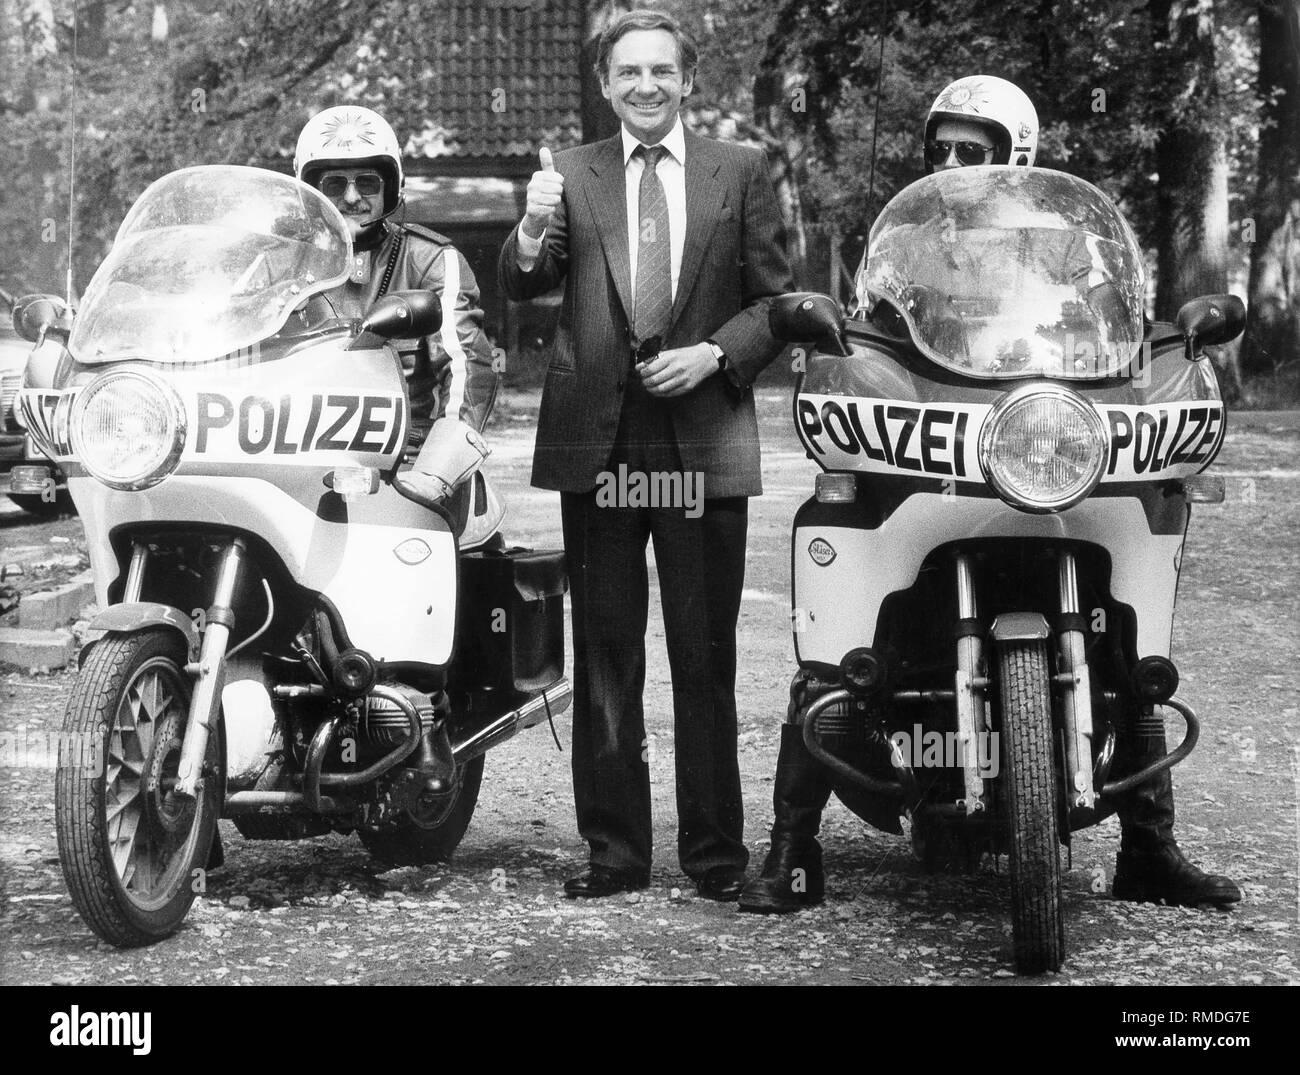 Harald Juhnke between two policemen on motorcycles. - Stock Image